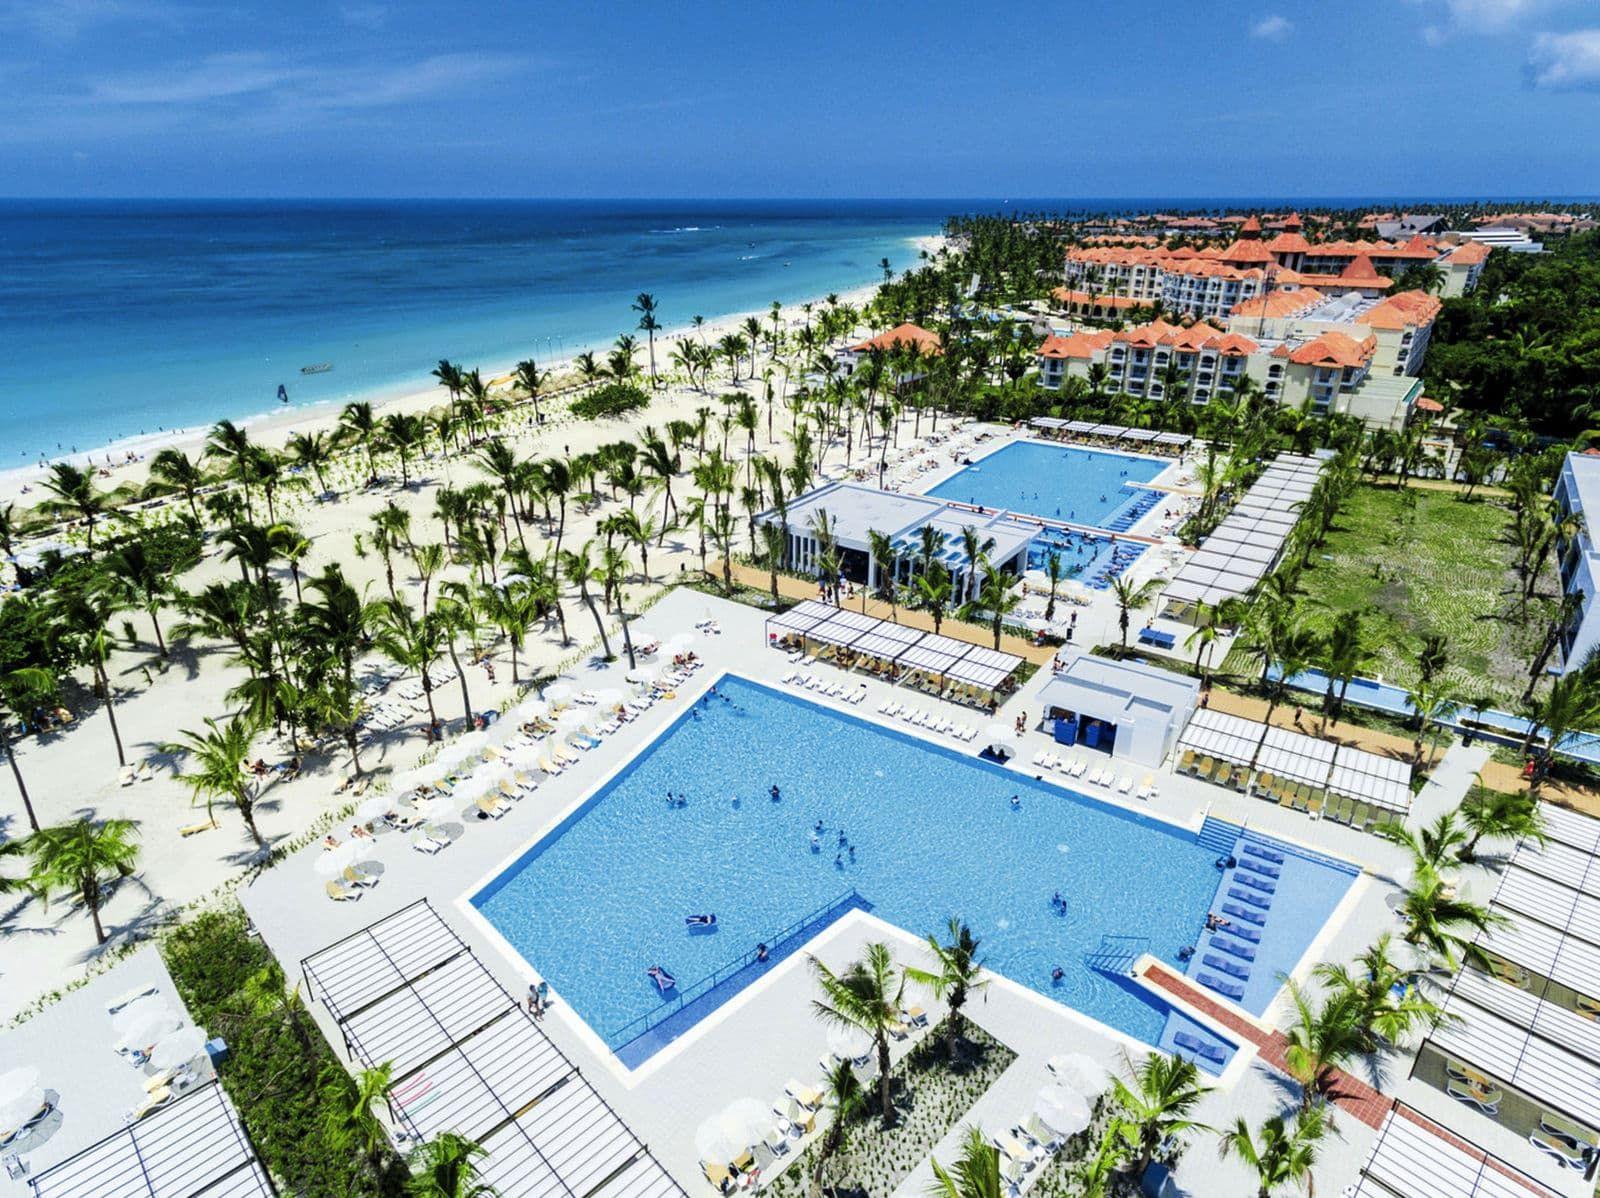 Riu Republica-günstig in den Urlaub